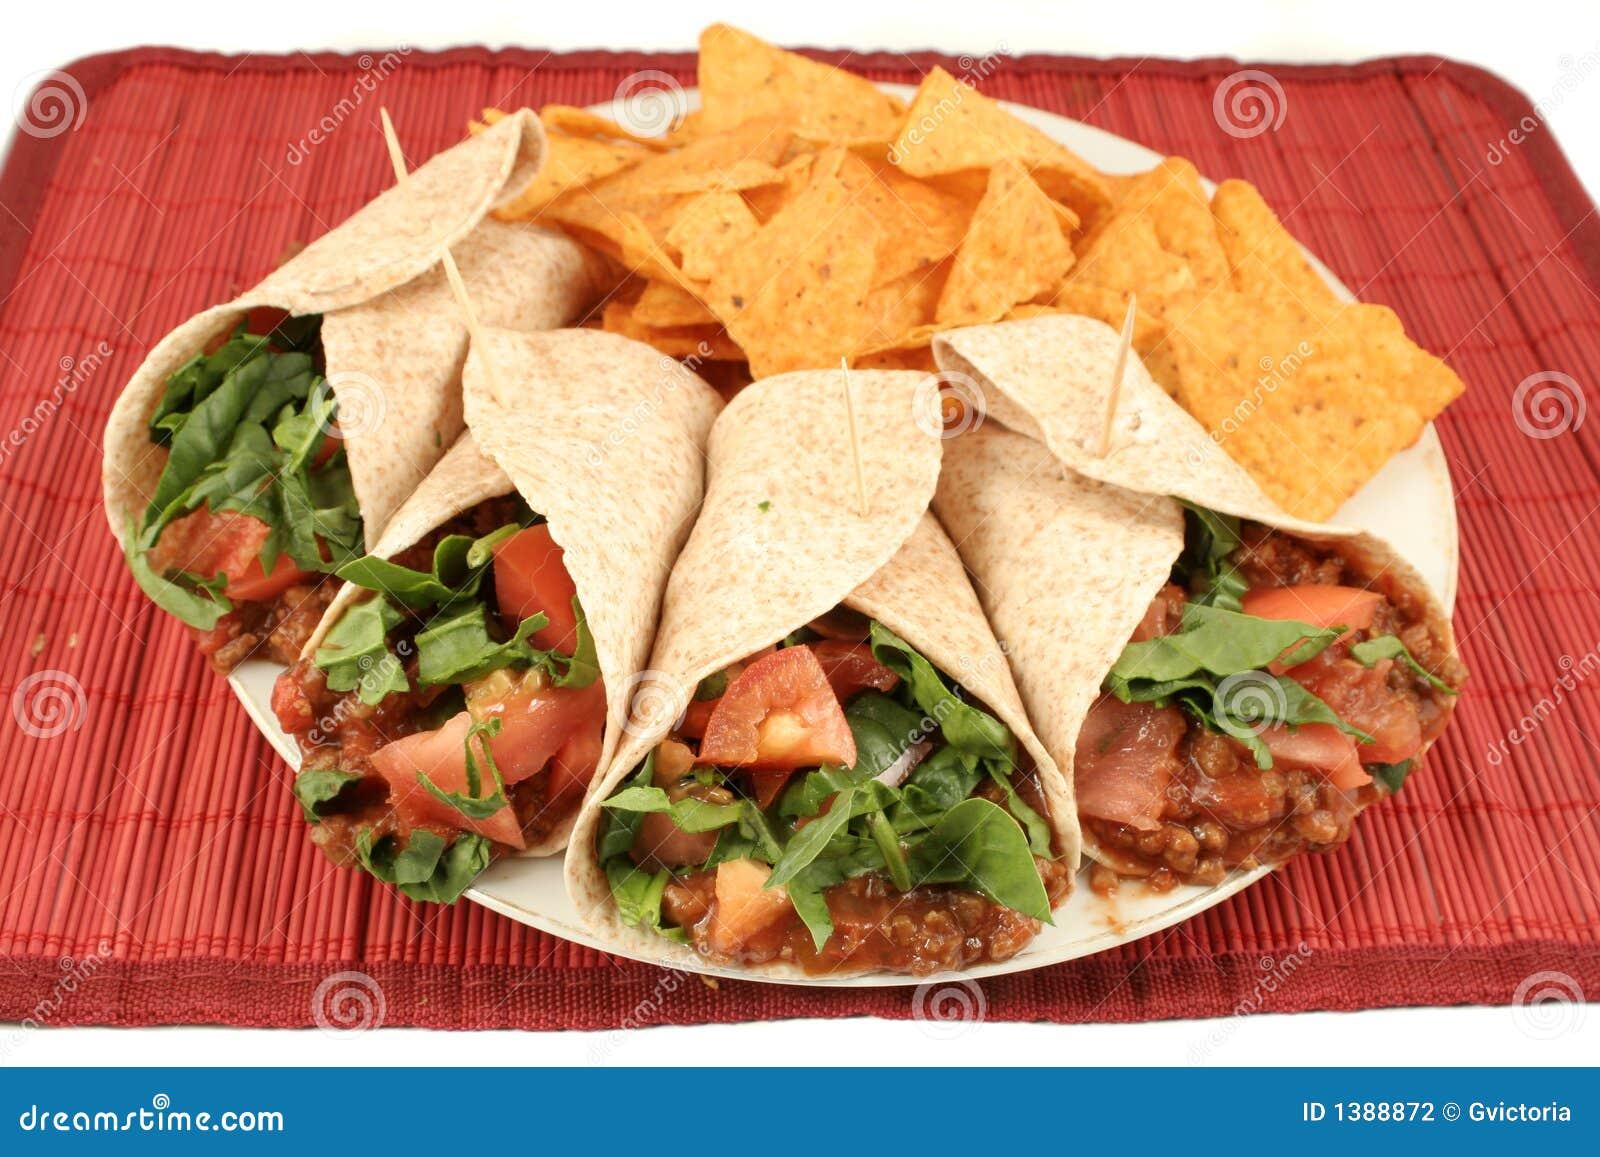 Nourriture mexicaine photo stock image du fajita d ner for Cuisine mexicaine